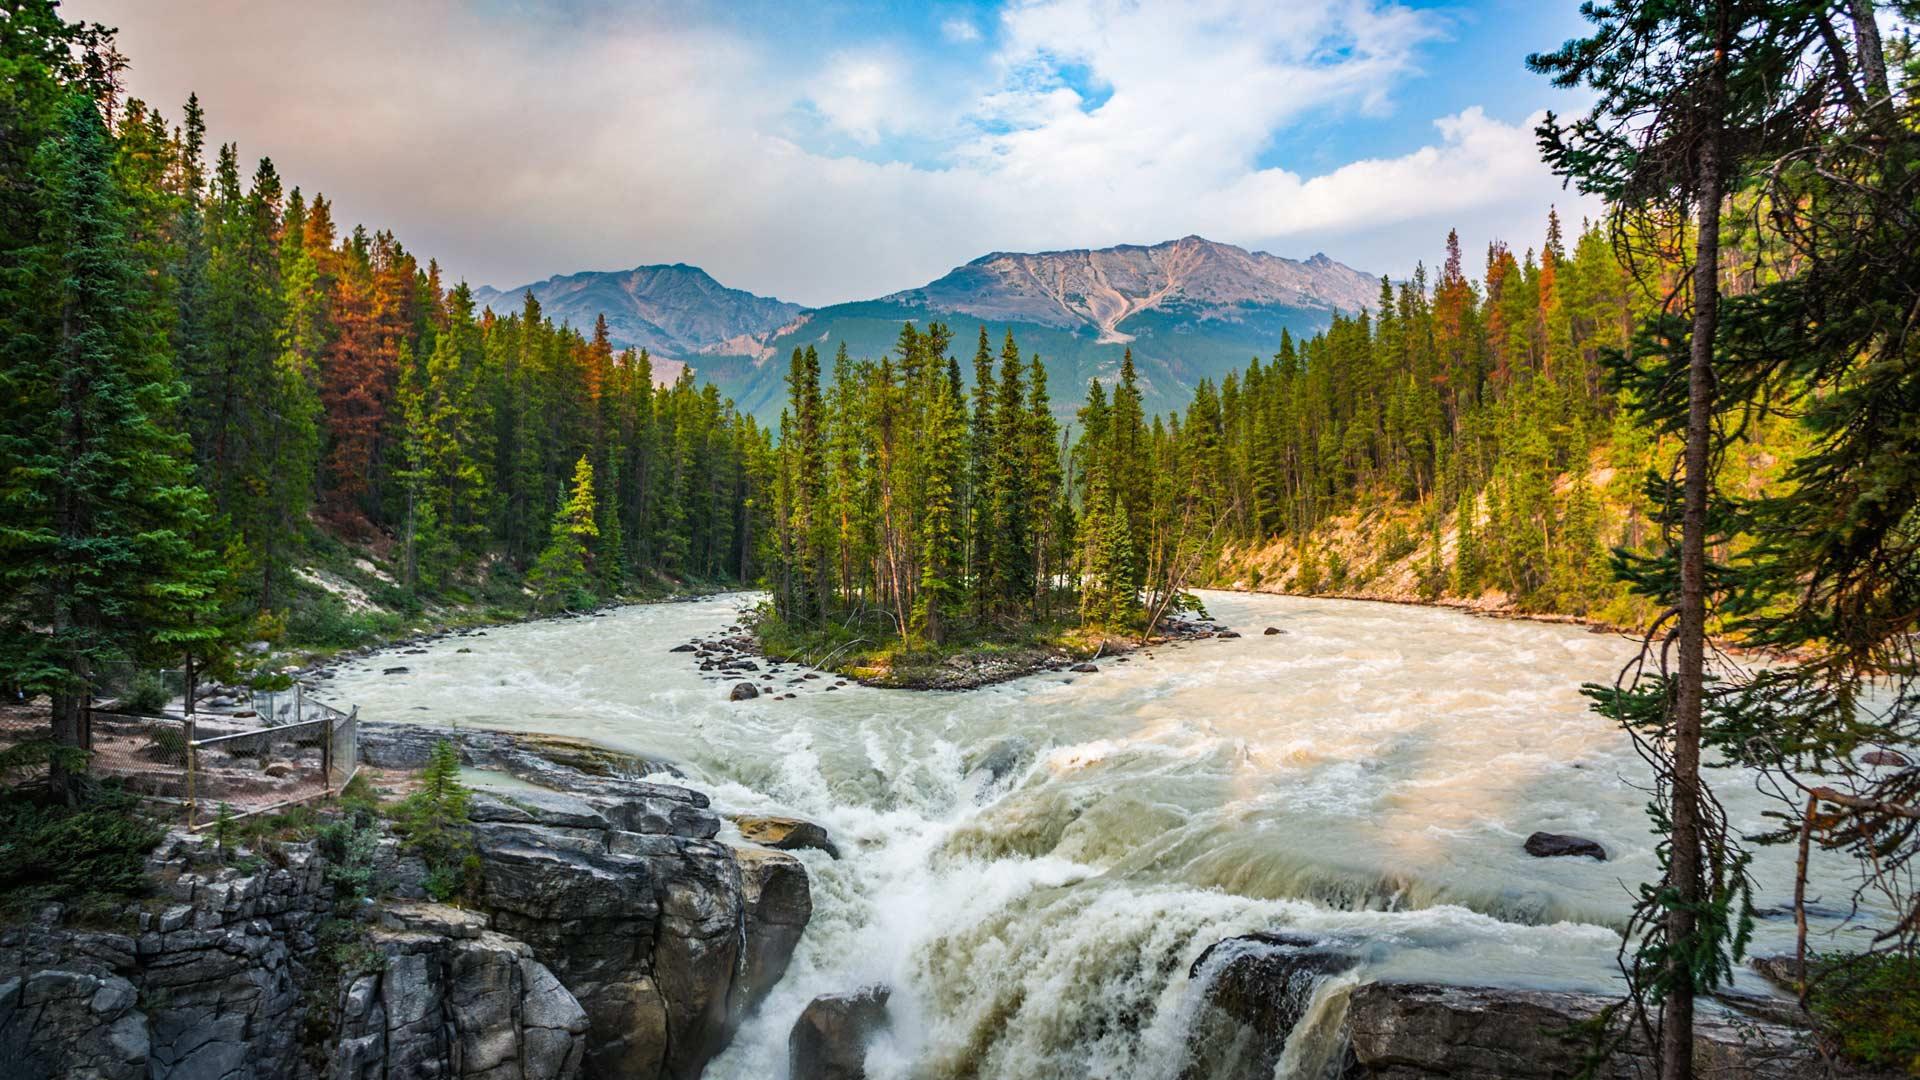 Sunwapta Falls in Jasper National Park, Canada (© Schroptschop/Getty Images)(Bing United States)